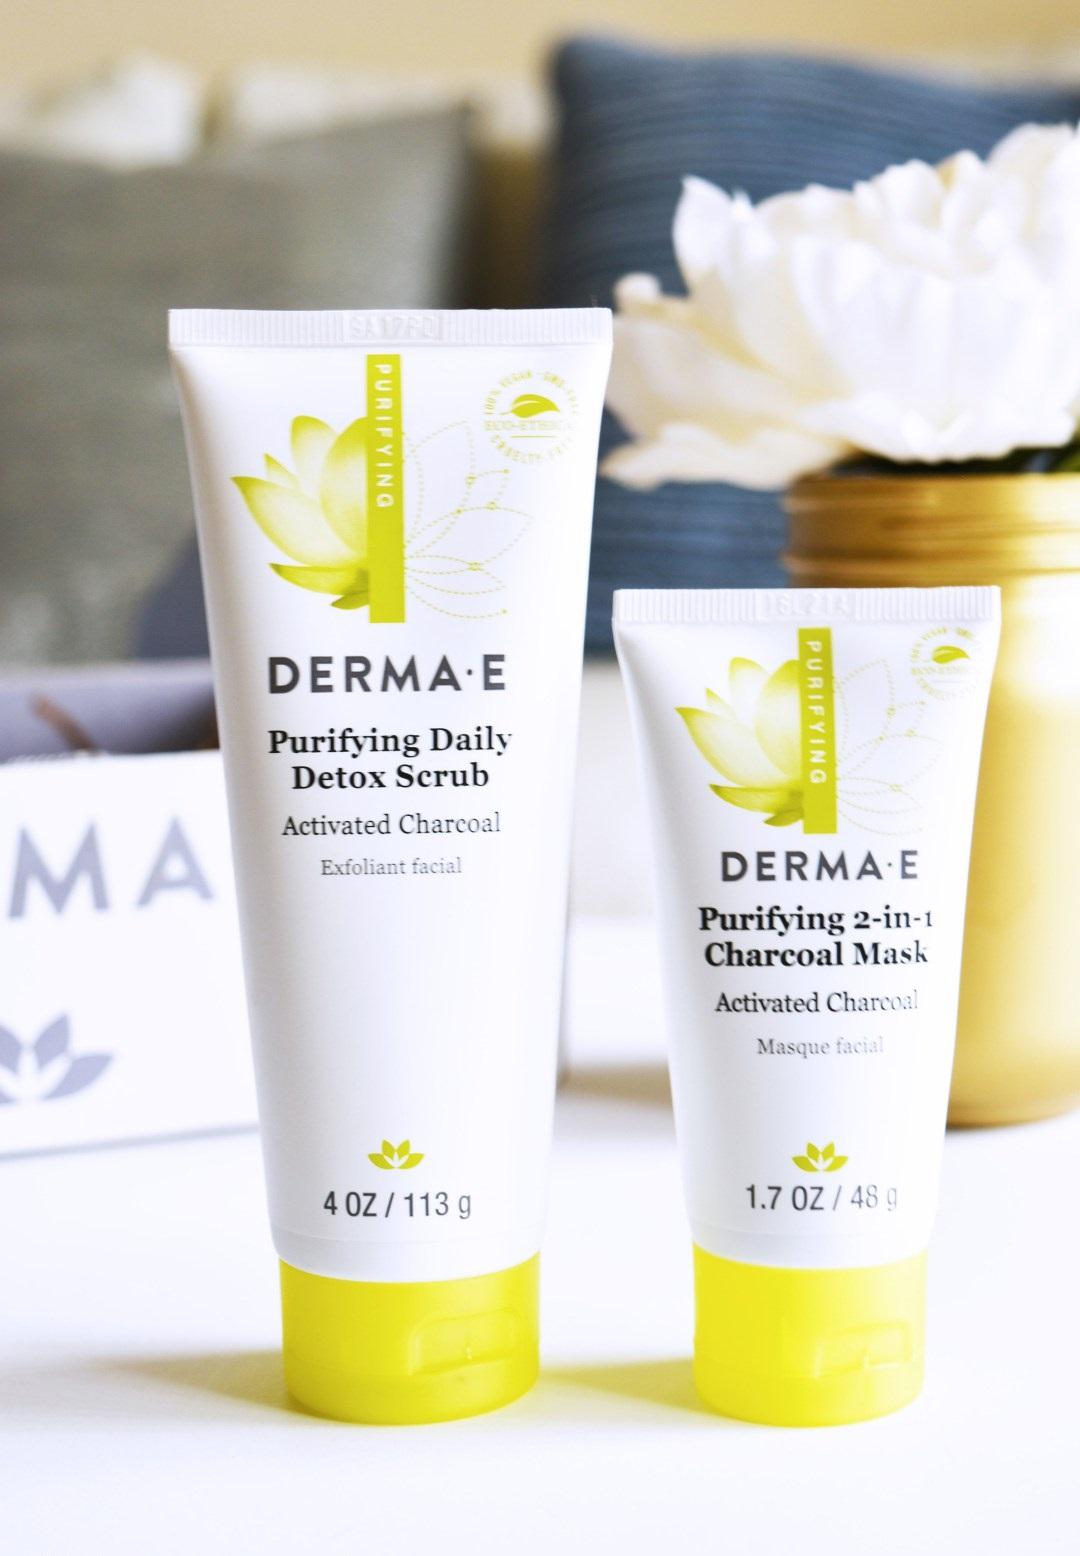 Derma-E Purifying Charcoal Mask